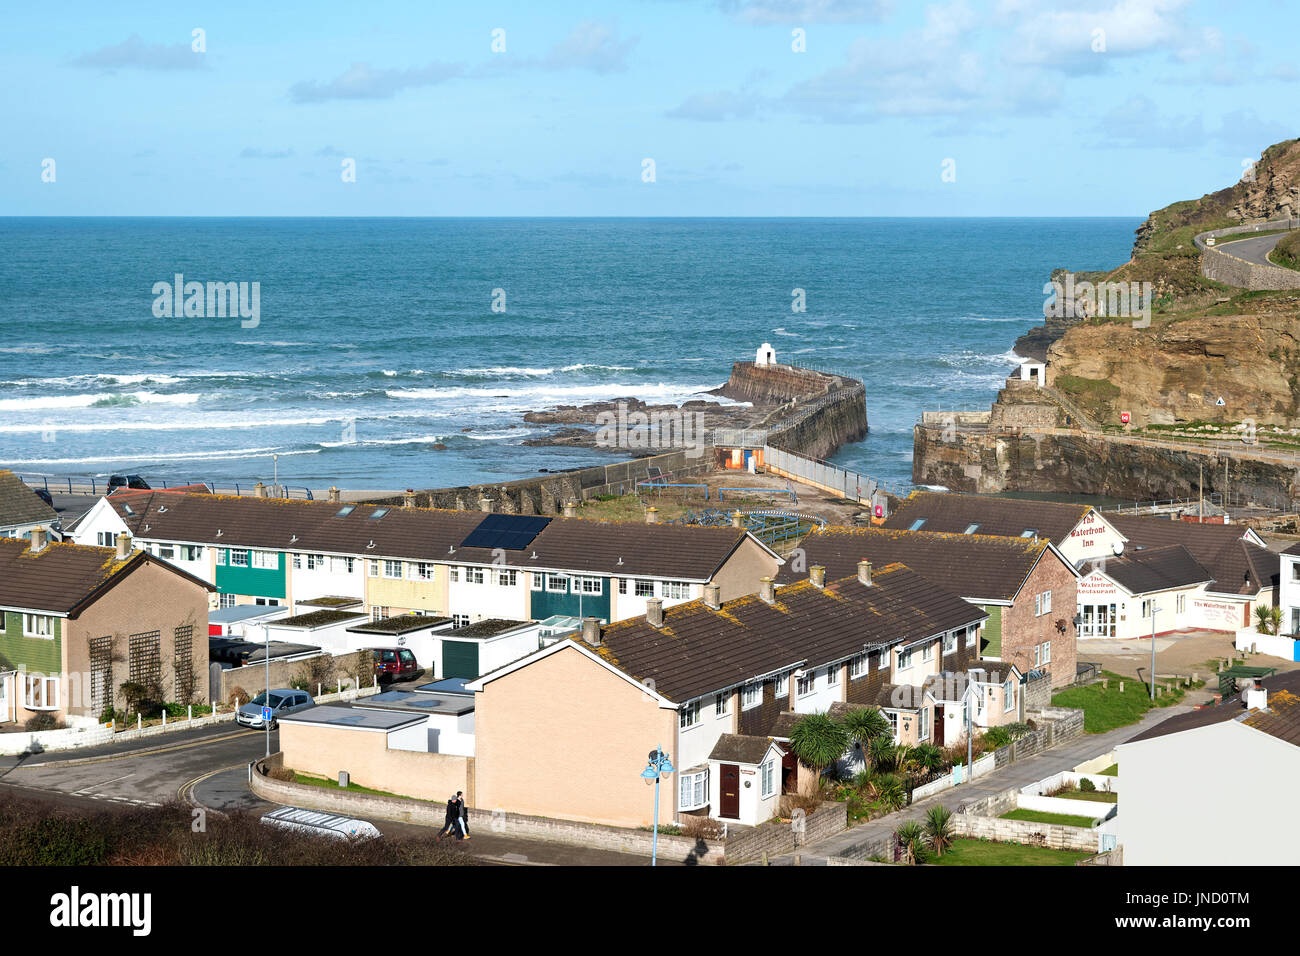 homes in the coastal village of portreath, cornwall, england, uk. - Stock Image